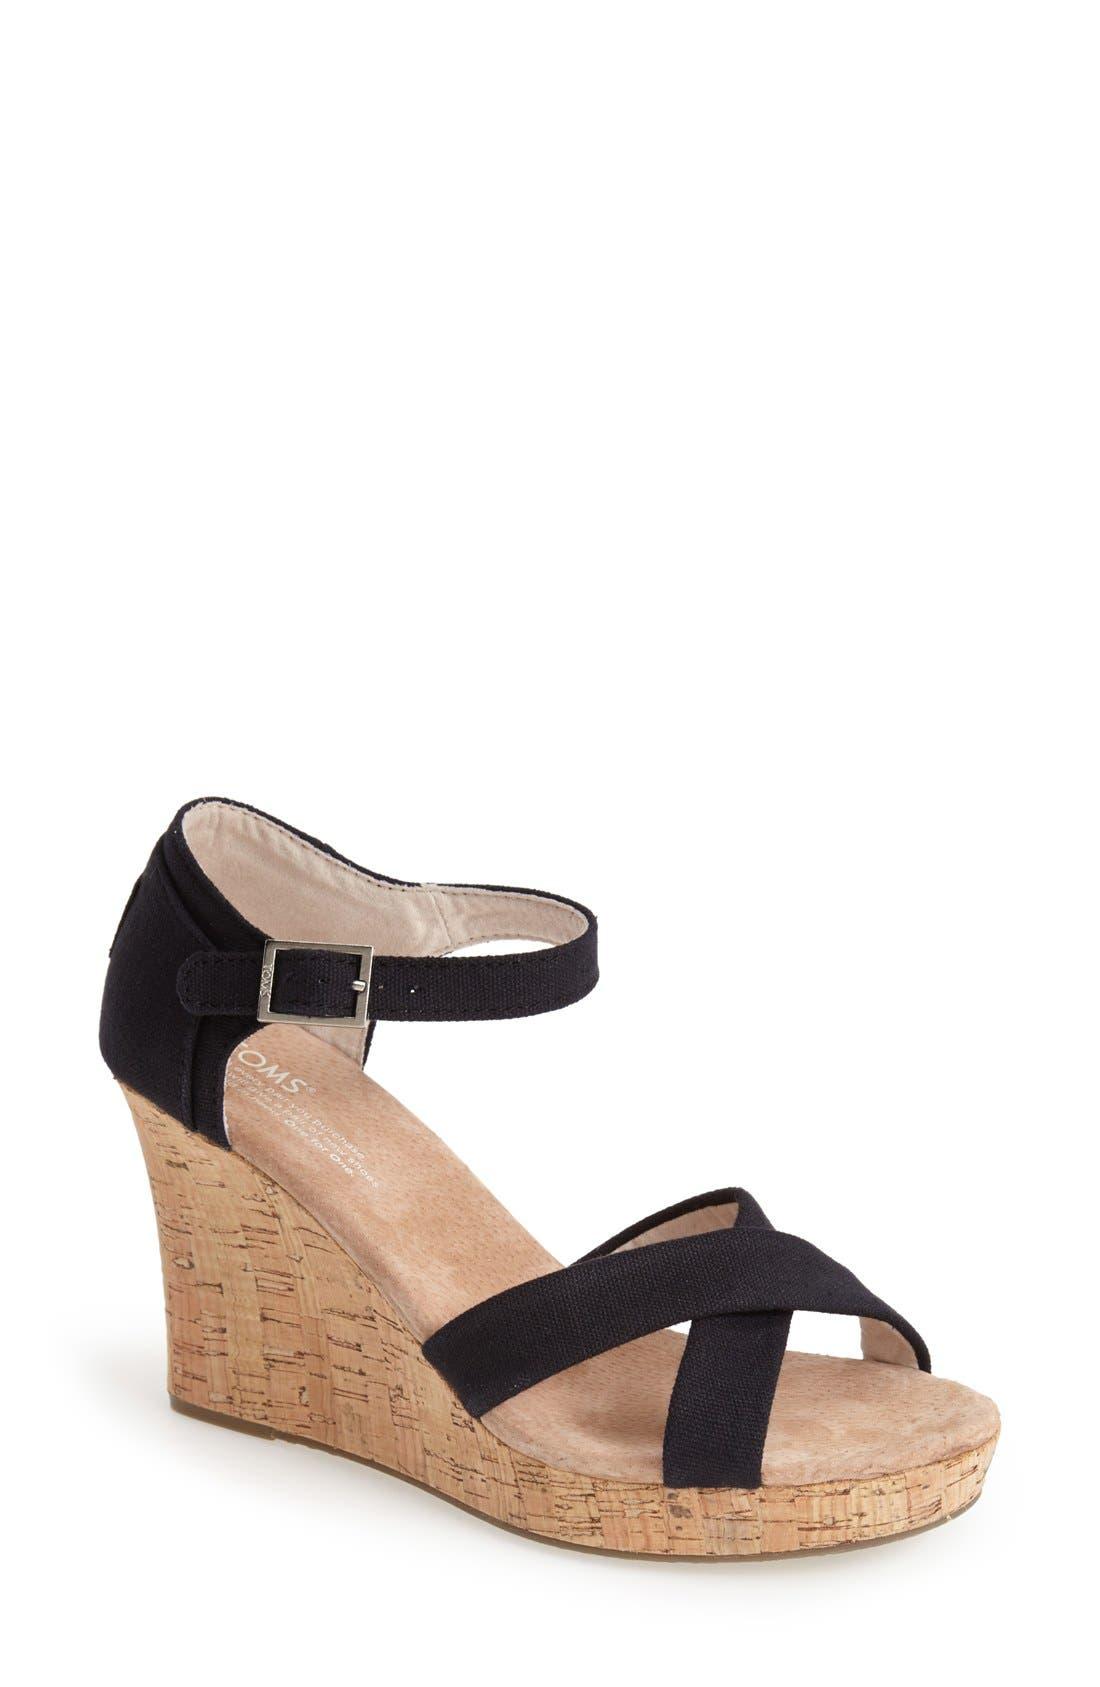 Canvas Ankle Strap Wedge Sandal,                         Main,                         color, 001